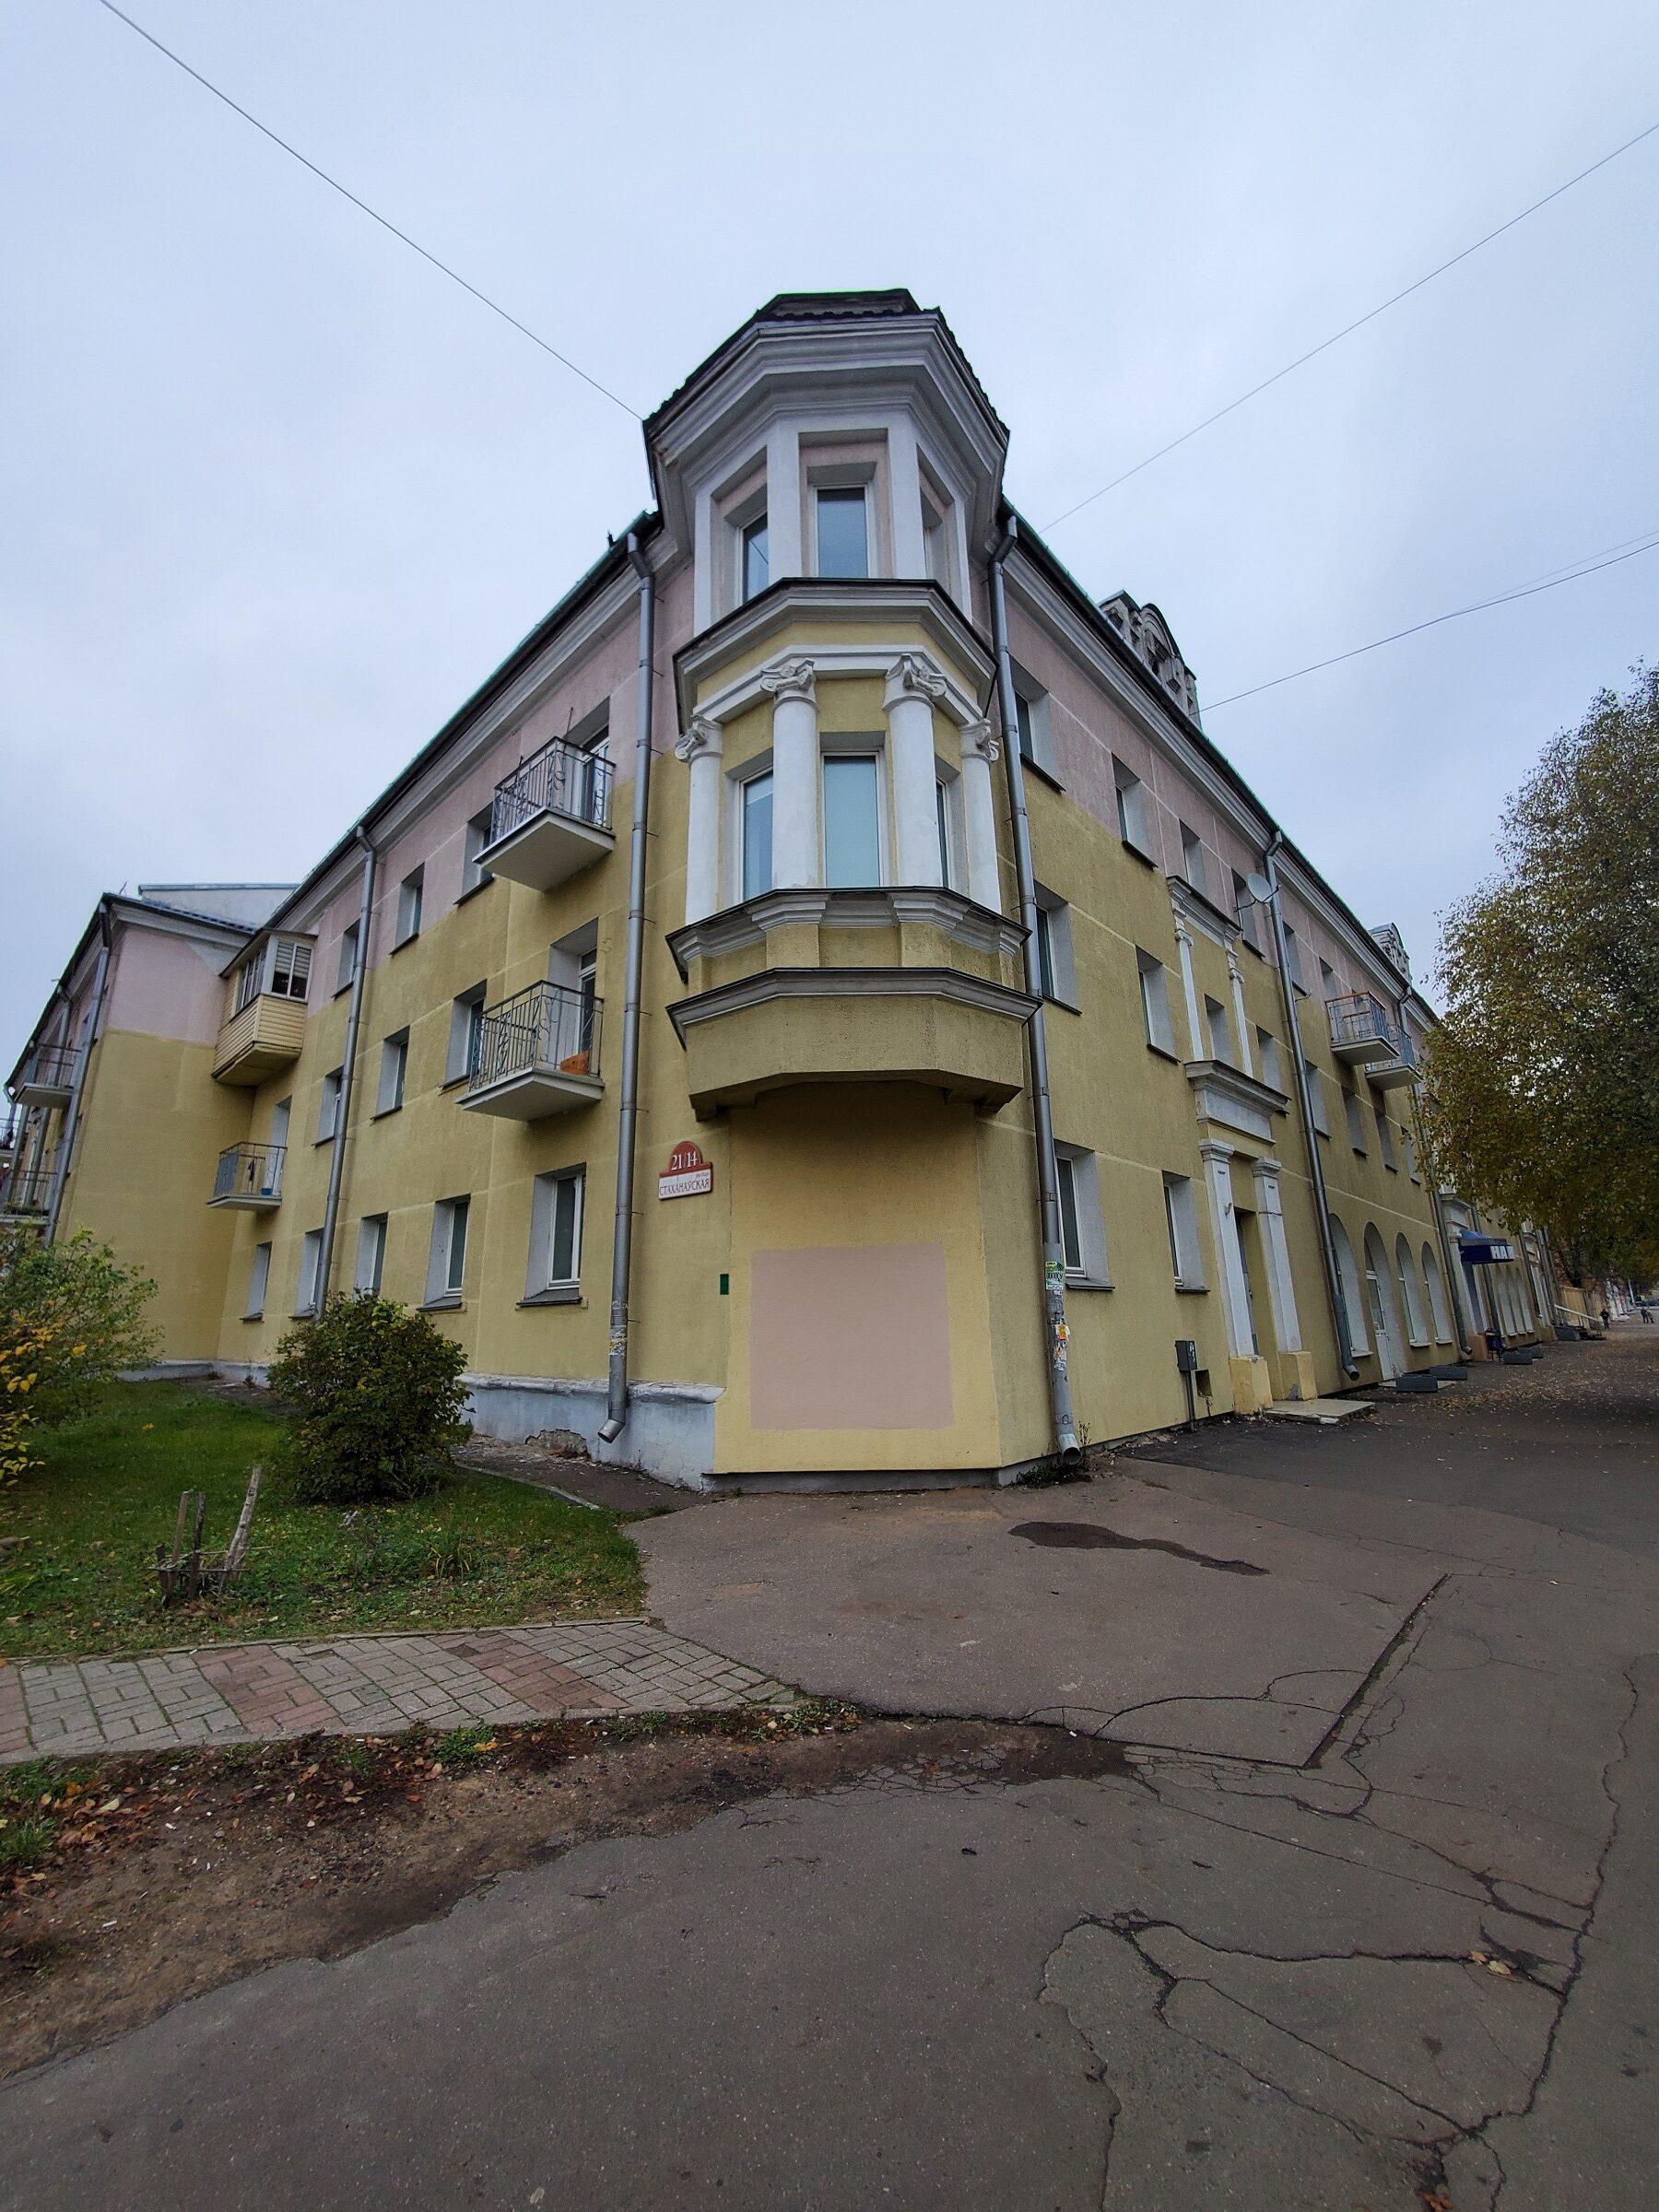 20201107 151558 2 rotated - Минск. Тракторозаводской поселок